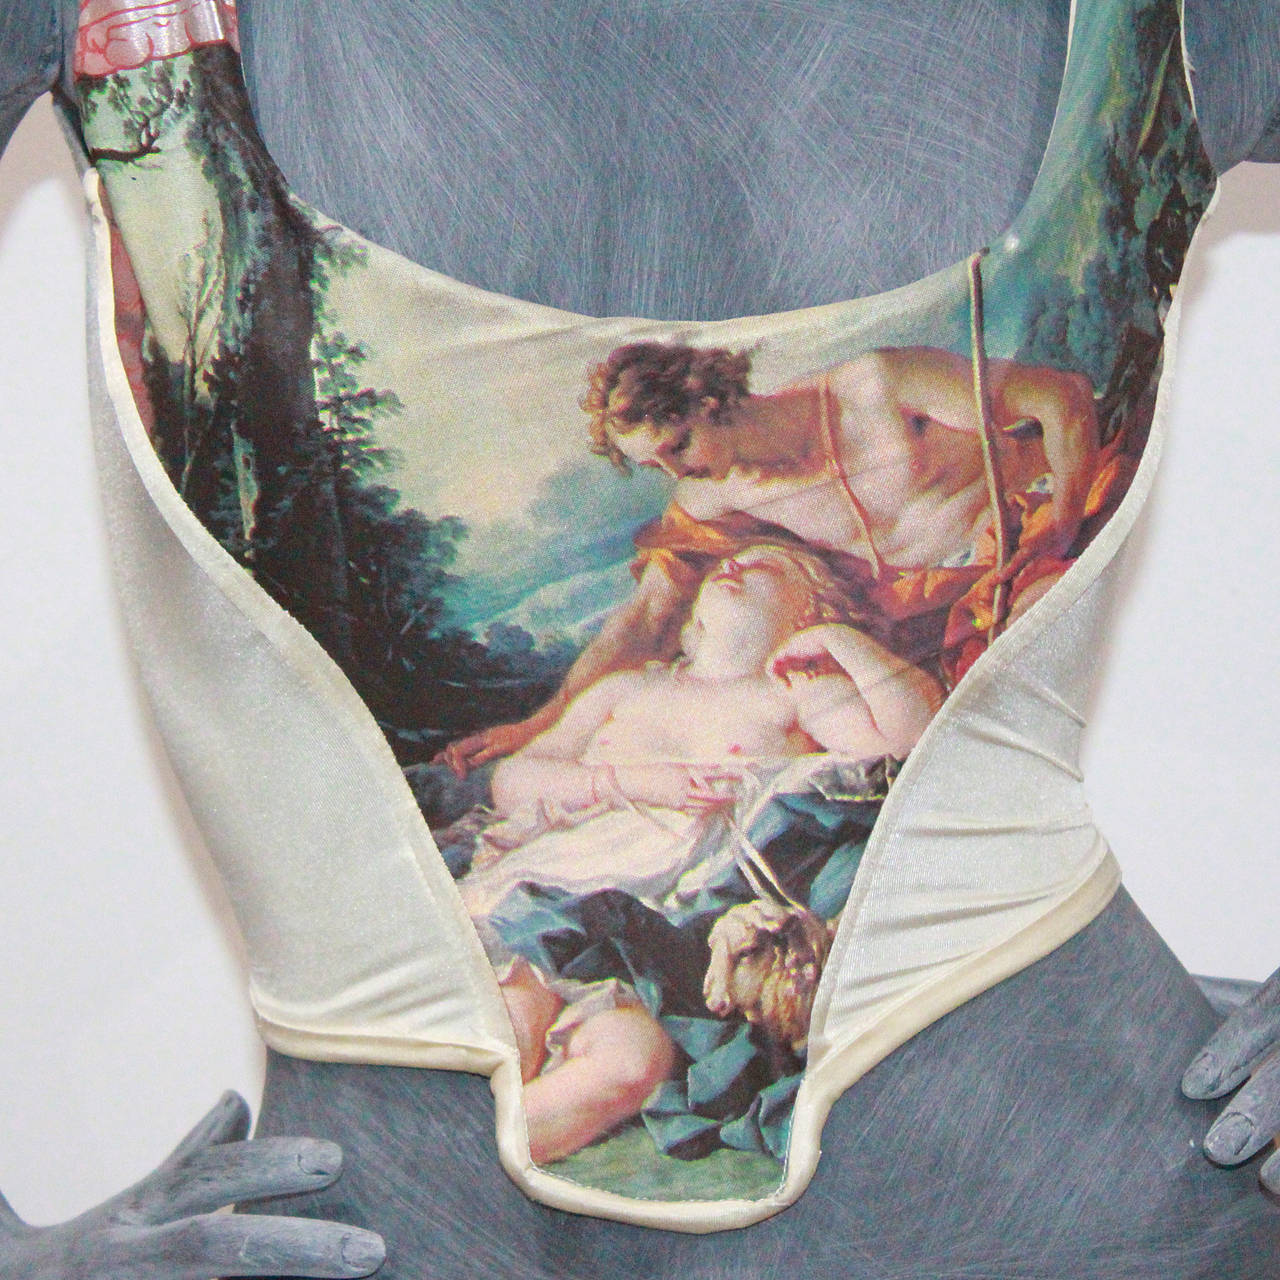 Rare Vivienne Westwood Boucher Corset From The Portrait Collection c.1990 2